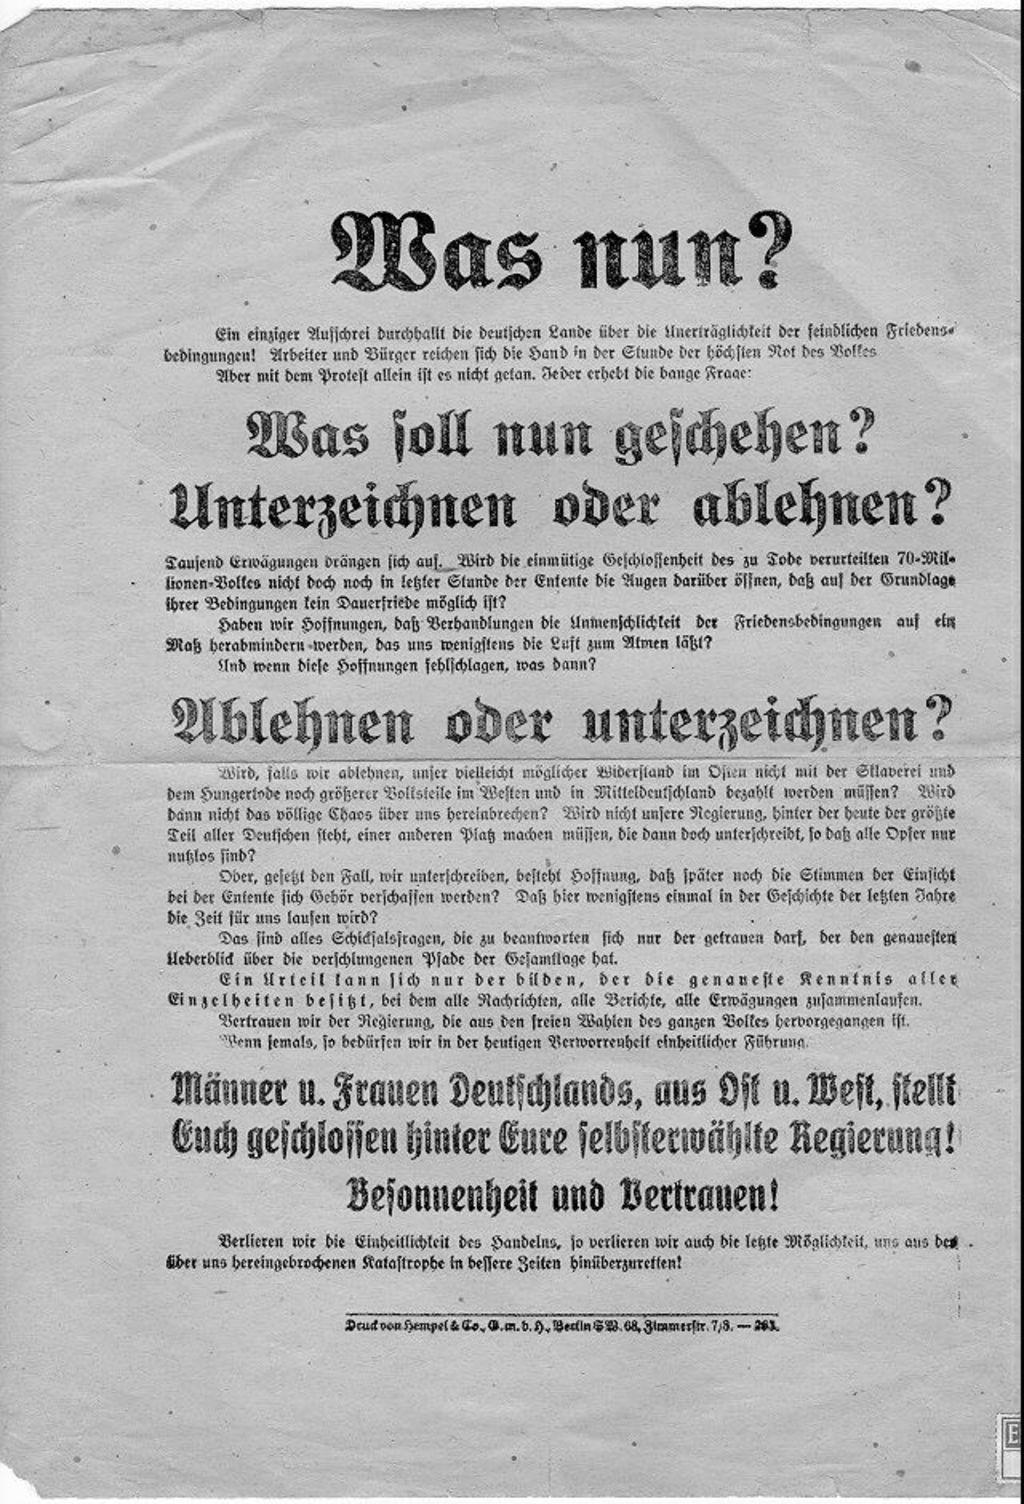 Lemo Kapitel Weimarer Republik Außenpolitik Pariser